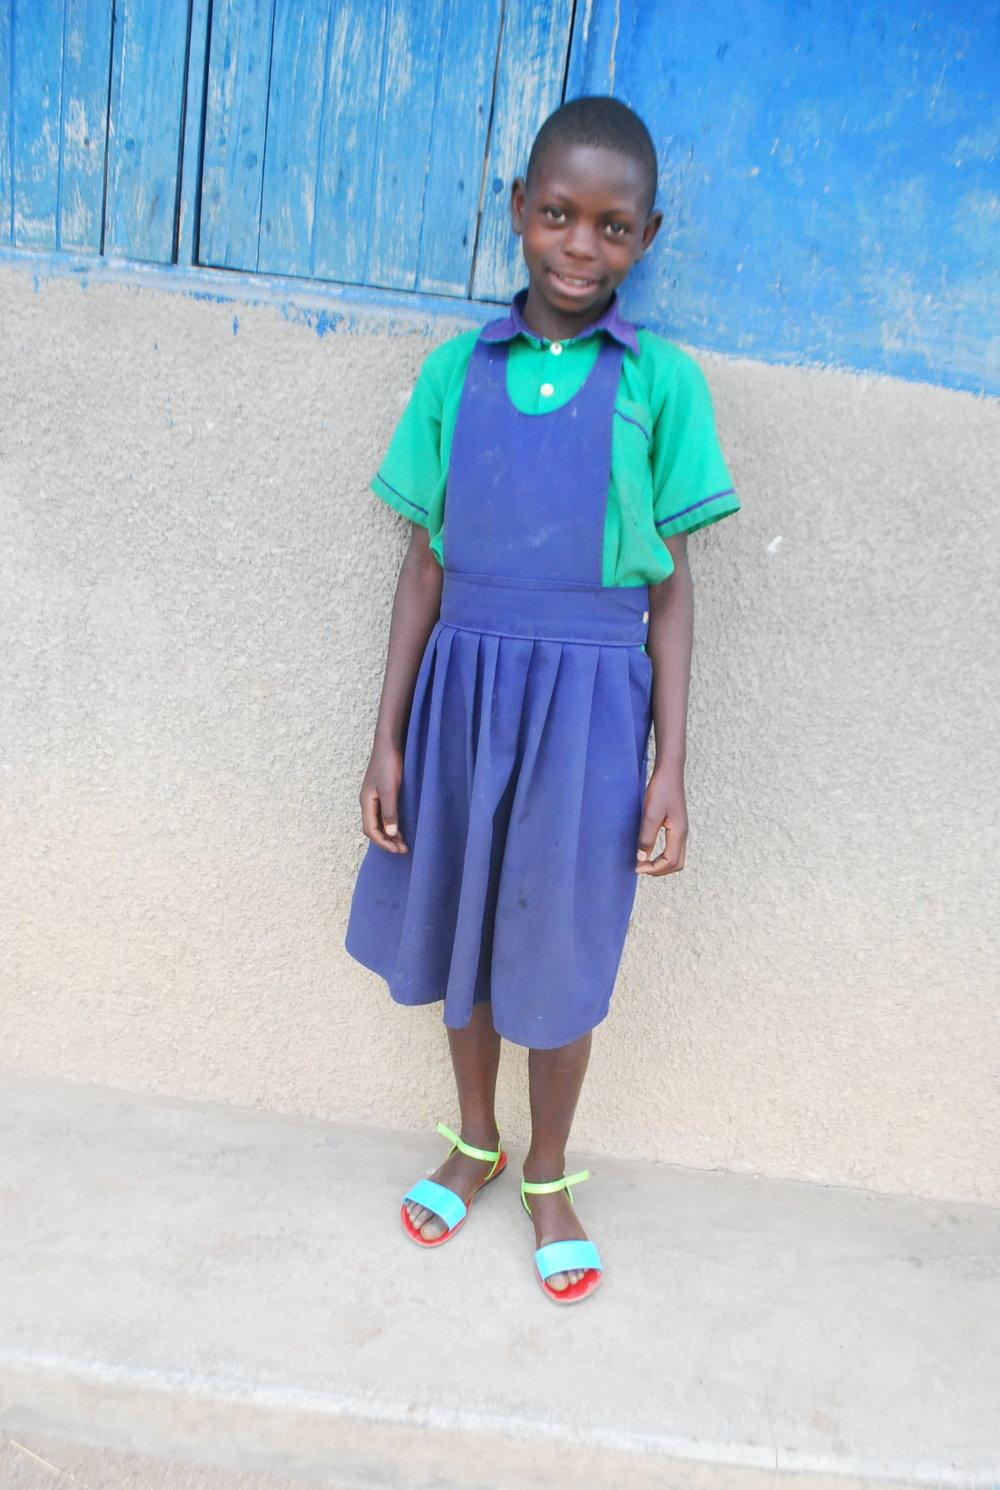 Masiaka Esther - Mammy died of Malaria Fever